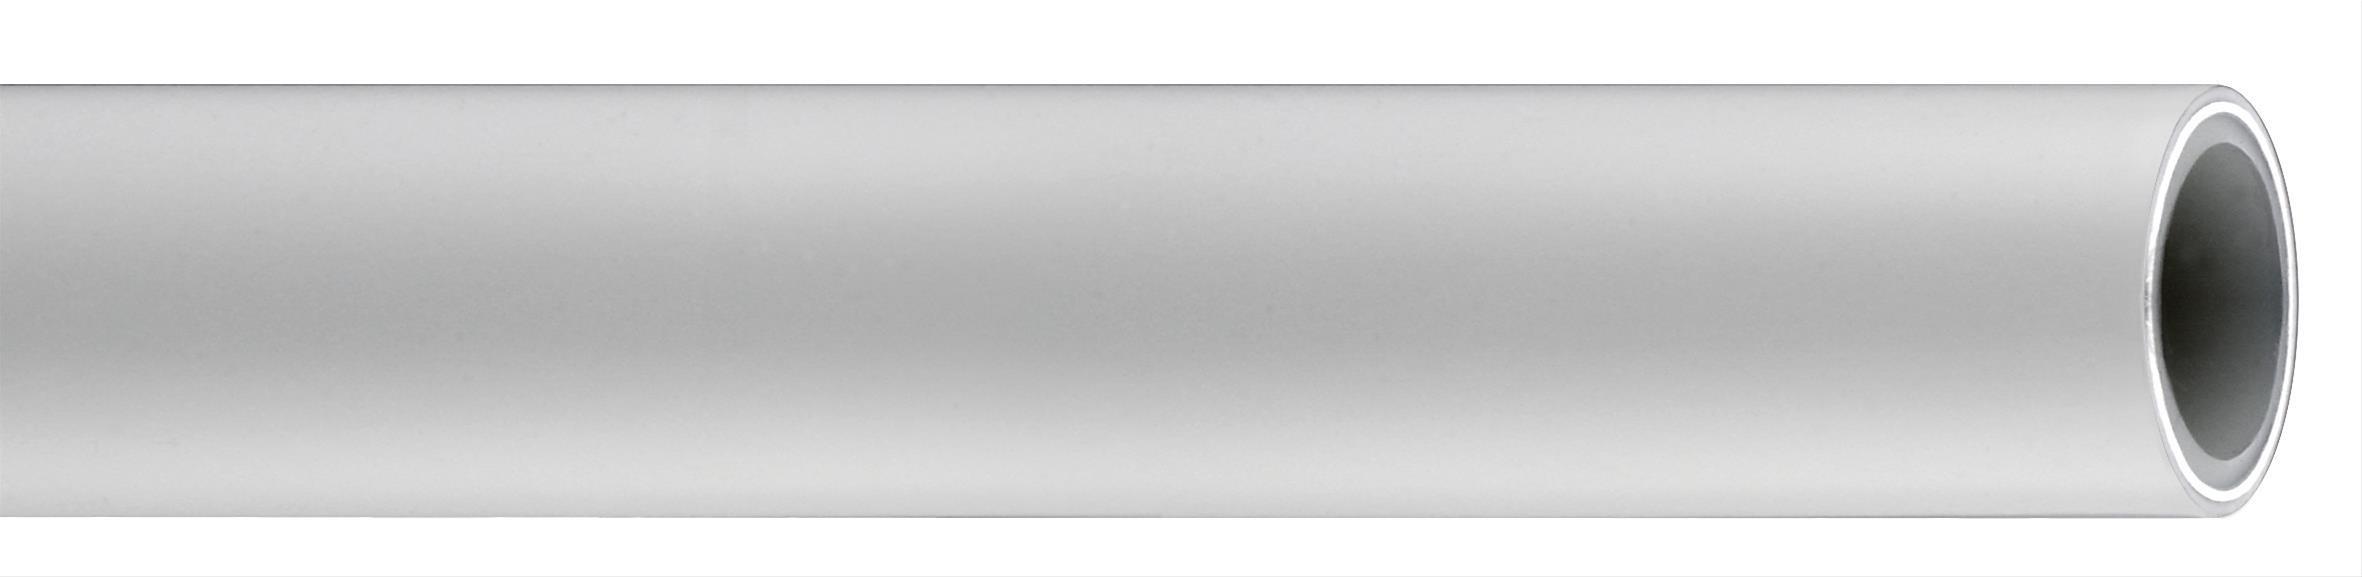 VRS PE-Xc/AI/PE-Xb Rohr Stg.2,5mx16 Bild 1